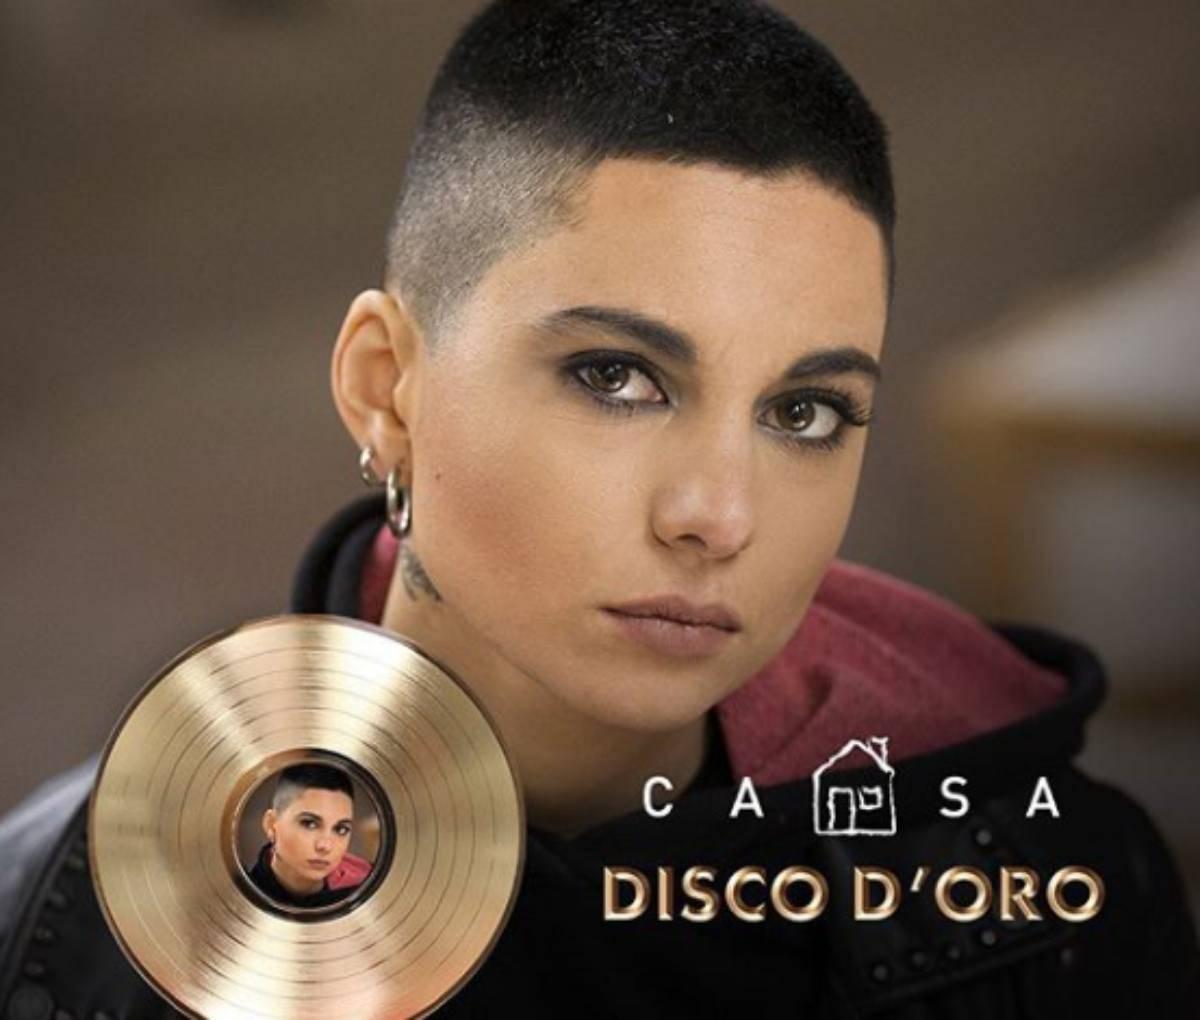 disco d'oro